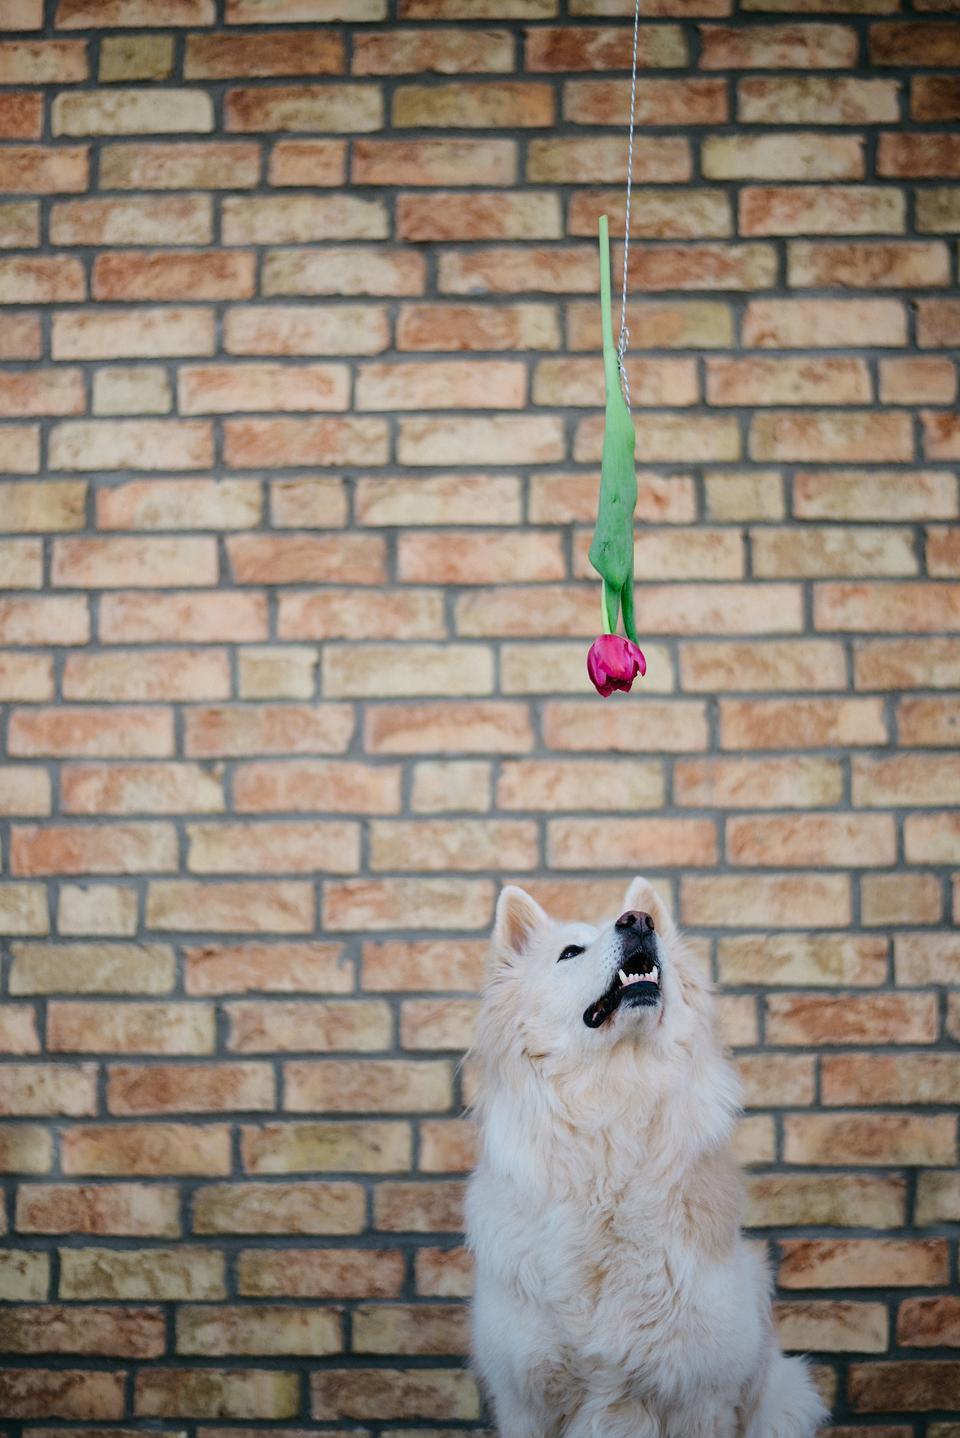 Tierfotografie Haustierfotografie Fotografie Fotograf Fotografin Hund Hunde Hochzeit Hundefotografie Karlsruhe Ettlingen Pforzheim Bretten Bruchsal Rastatt Shooting Elo Großelo Eurasier Chow Chow Bobtail Glatthaar Rauhaar Familienhund Mischling Spanien Straßenhund Tierschutz Valentinstag Tulpe Blume 14